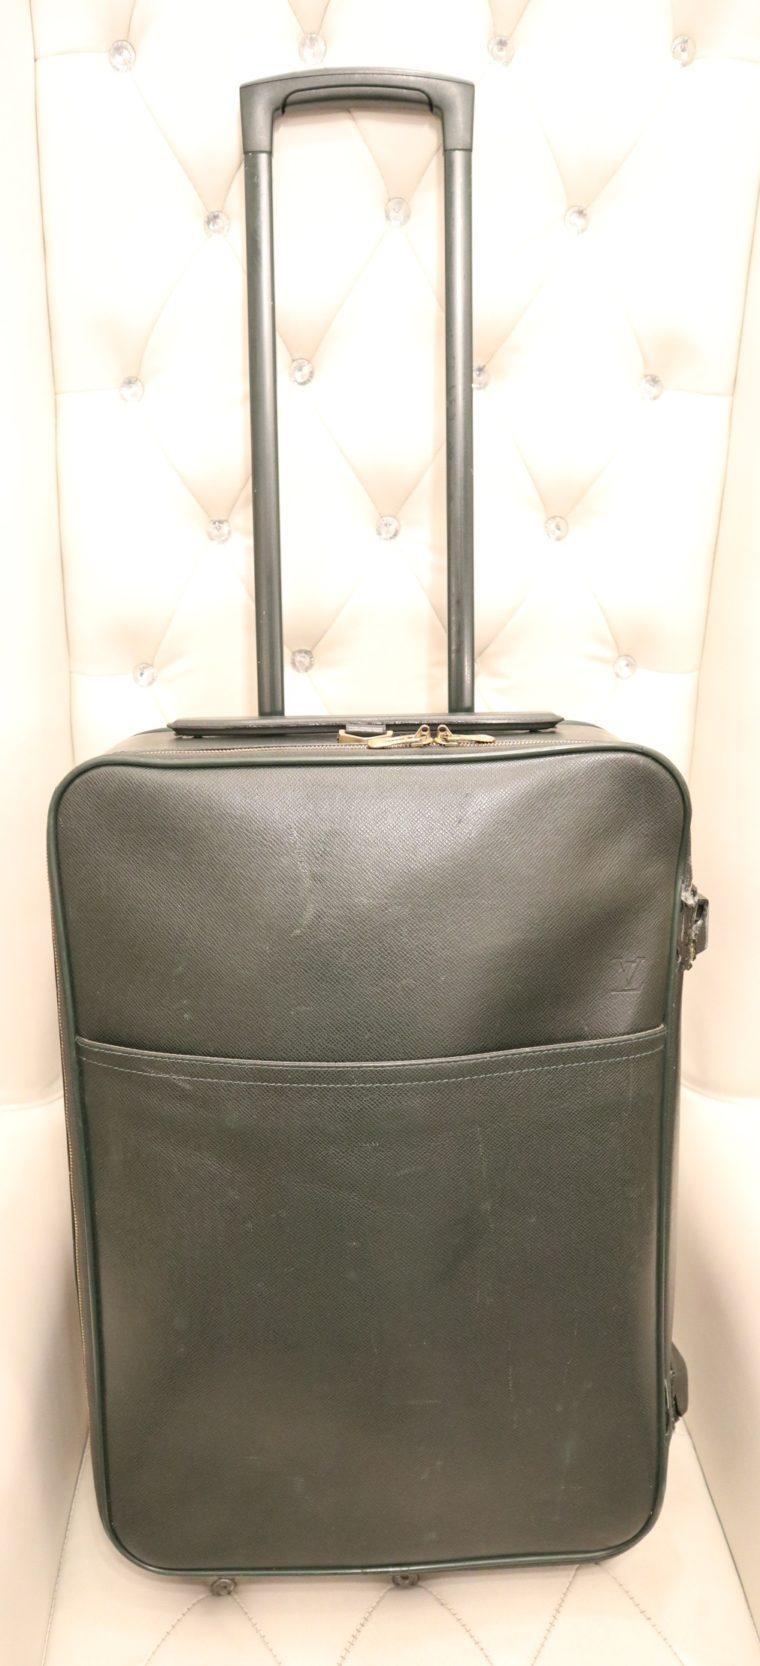 Louis Vuitton Trolley Koffer Pégase 55 Taiga Leder grün-0